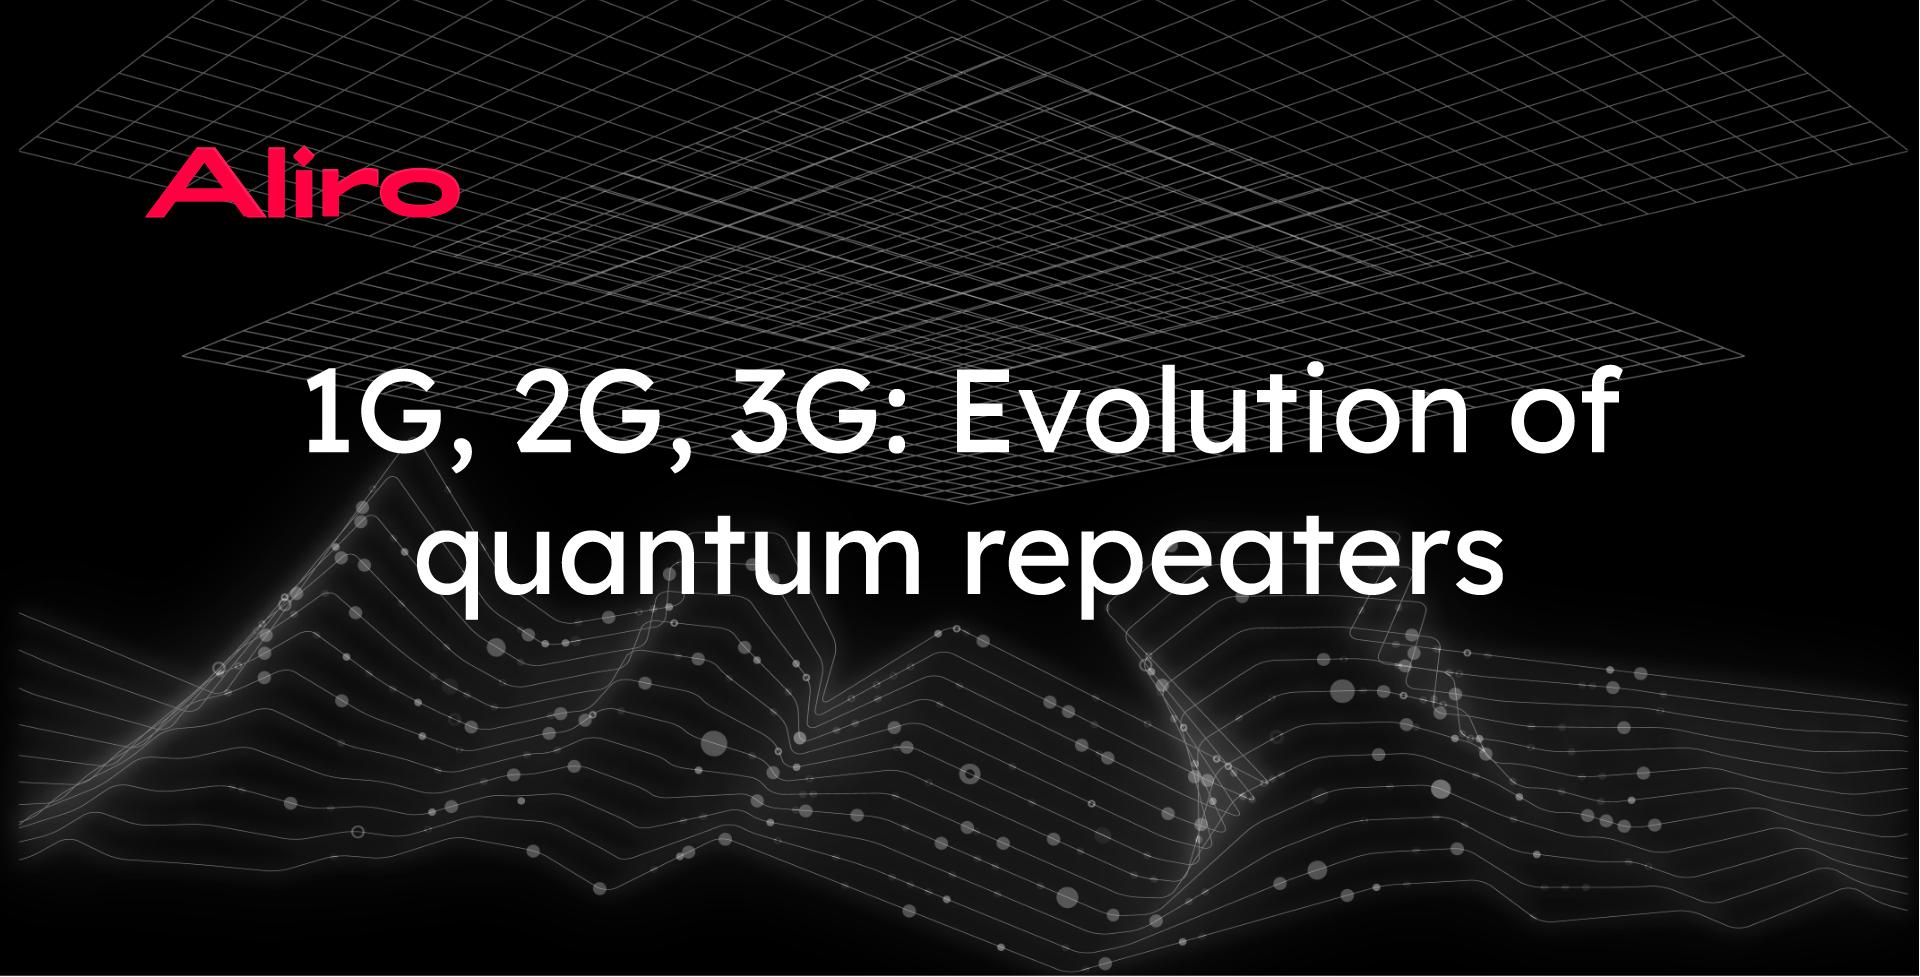 1G, 2G, 3G: Evolution of quantum repeaters